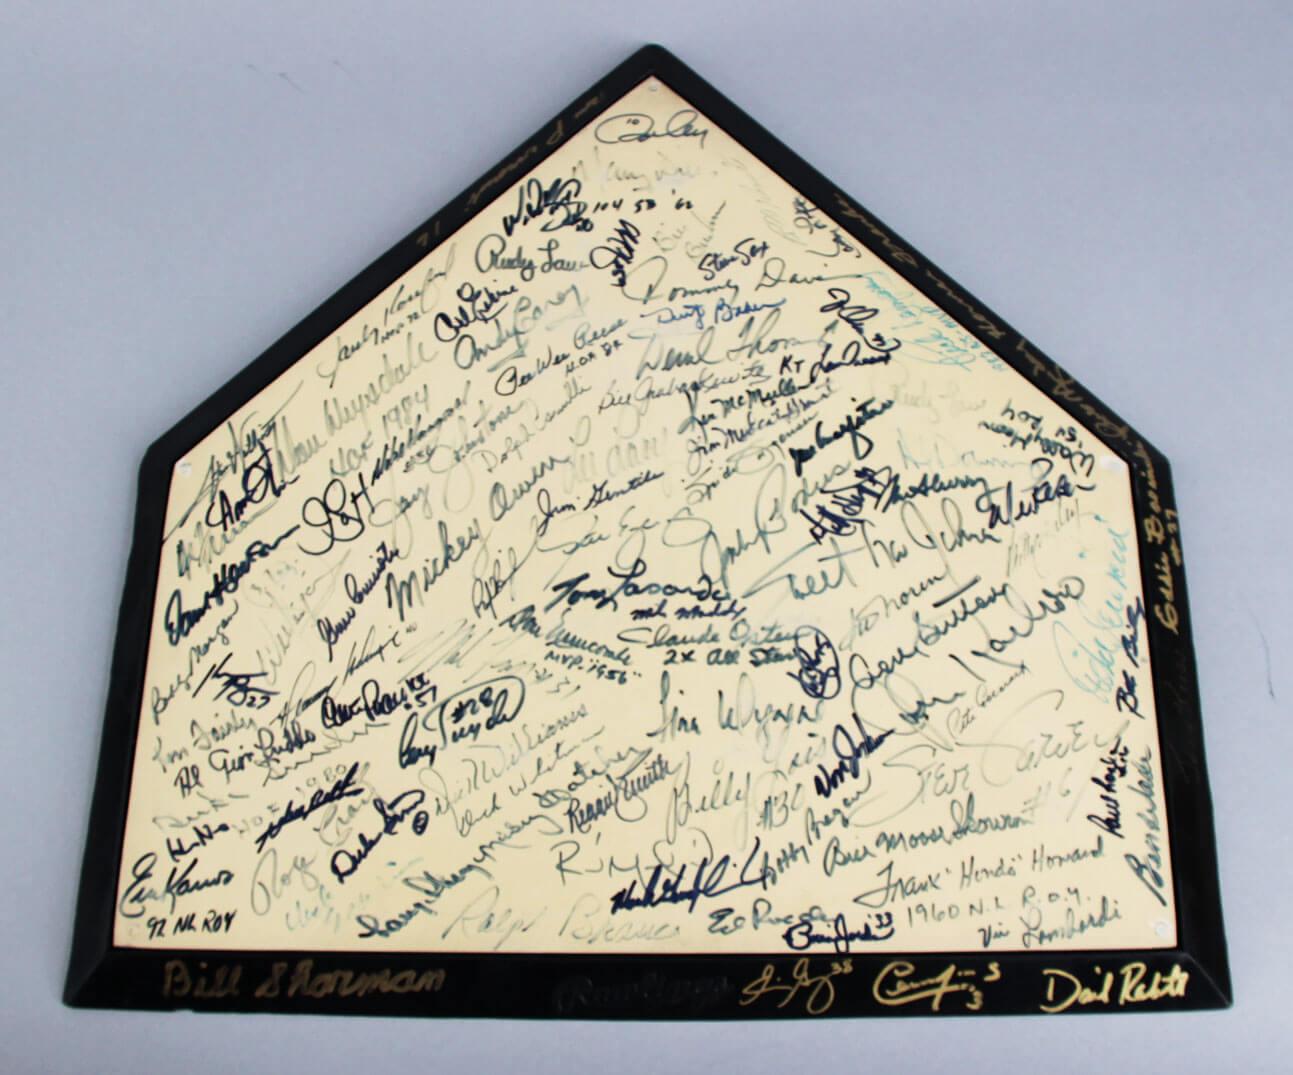 Pleasant Brooklyn Los Angeles Dodgers Hofers Stars Multi Signed Home Plate 100 Sigs Sandy Koufax Jsa Download Free Architecture Designs Rallybritishbridgeorg